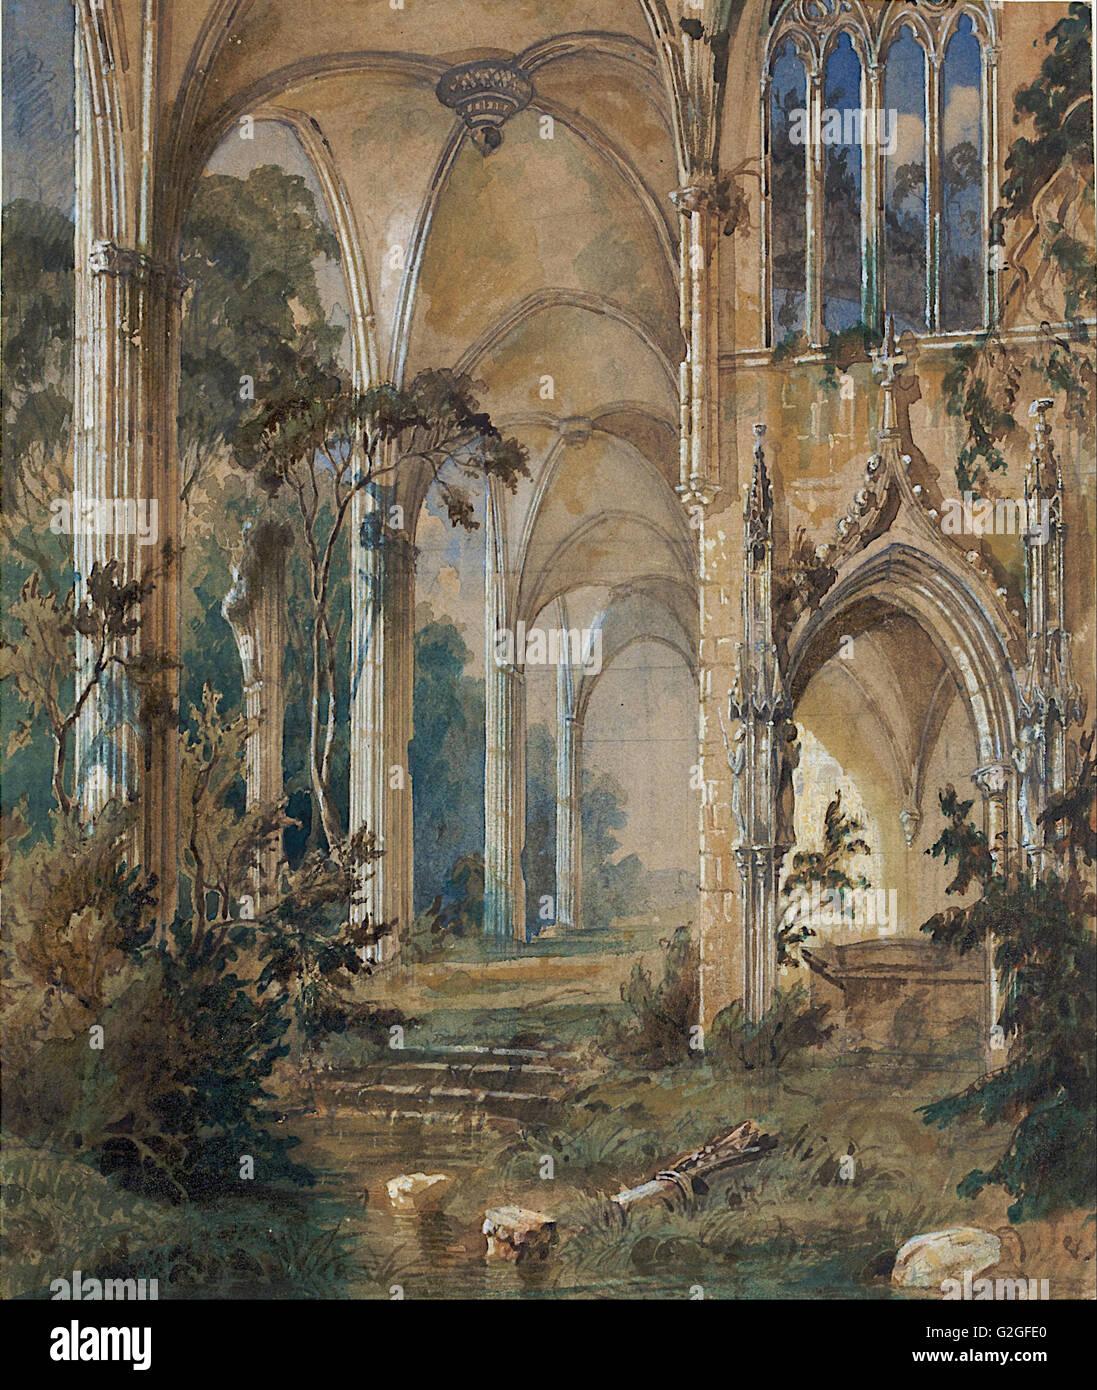 Carl Blechen - Gothic Church Ruin - Museum Kunstpalast, Düsseldorf - Stock Image